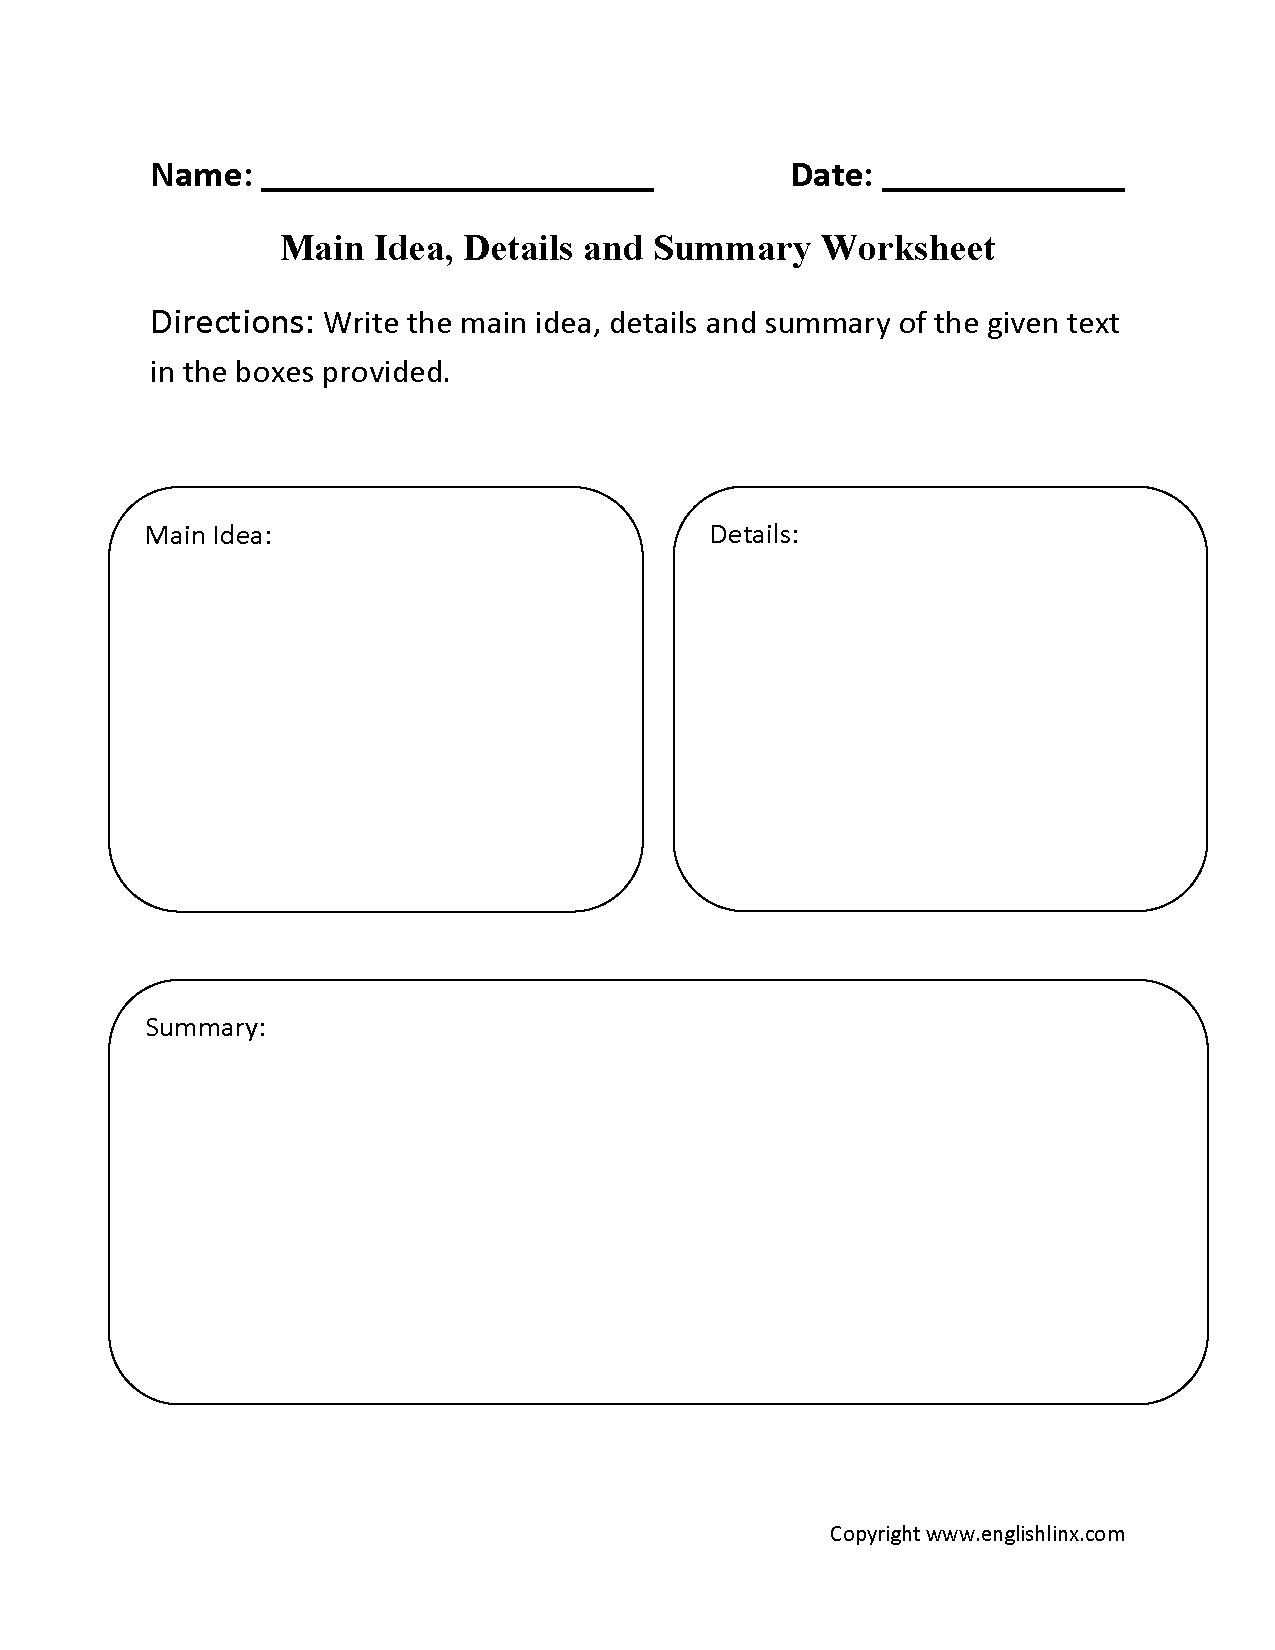 Main Idea Worksheets | Main Idea, Details and Summary Worksheet